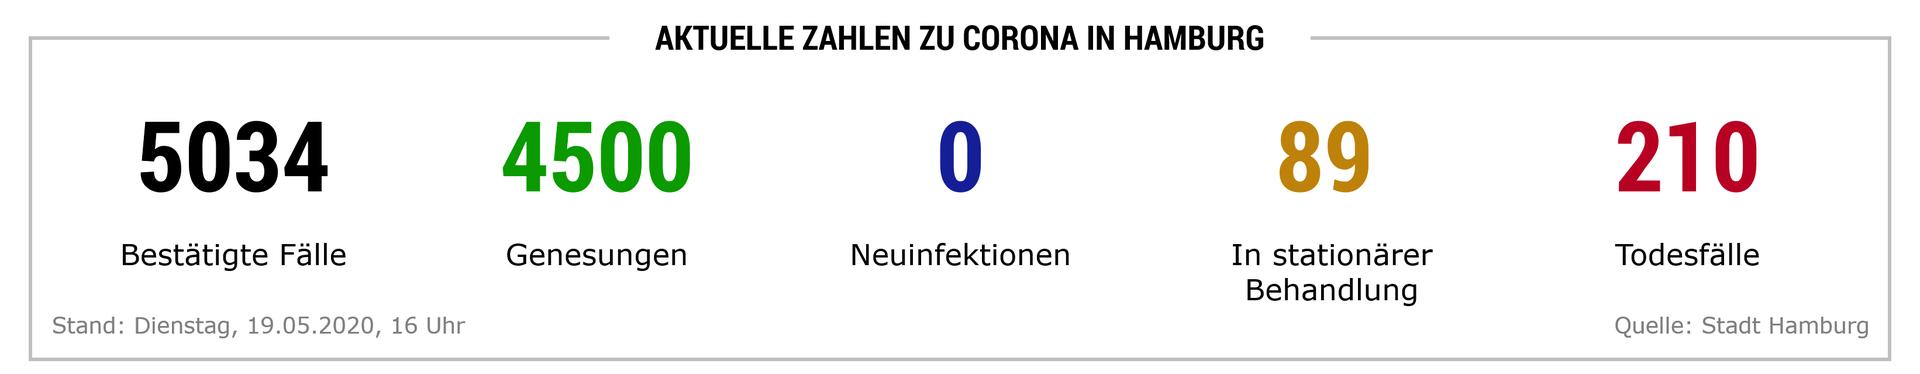 Corona Zahlen In Hamburg